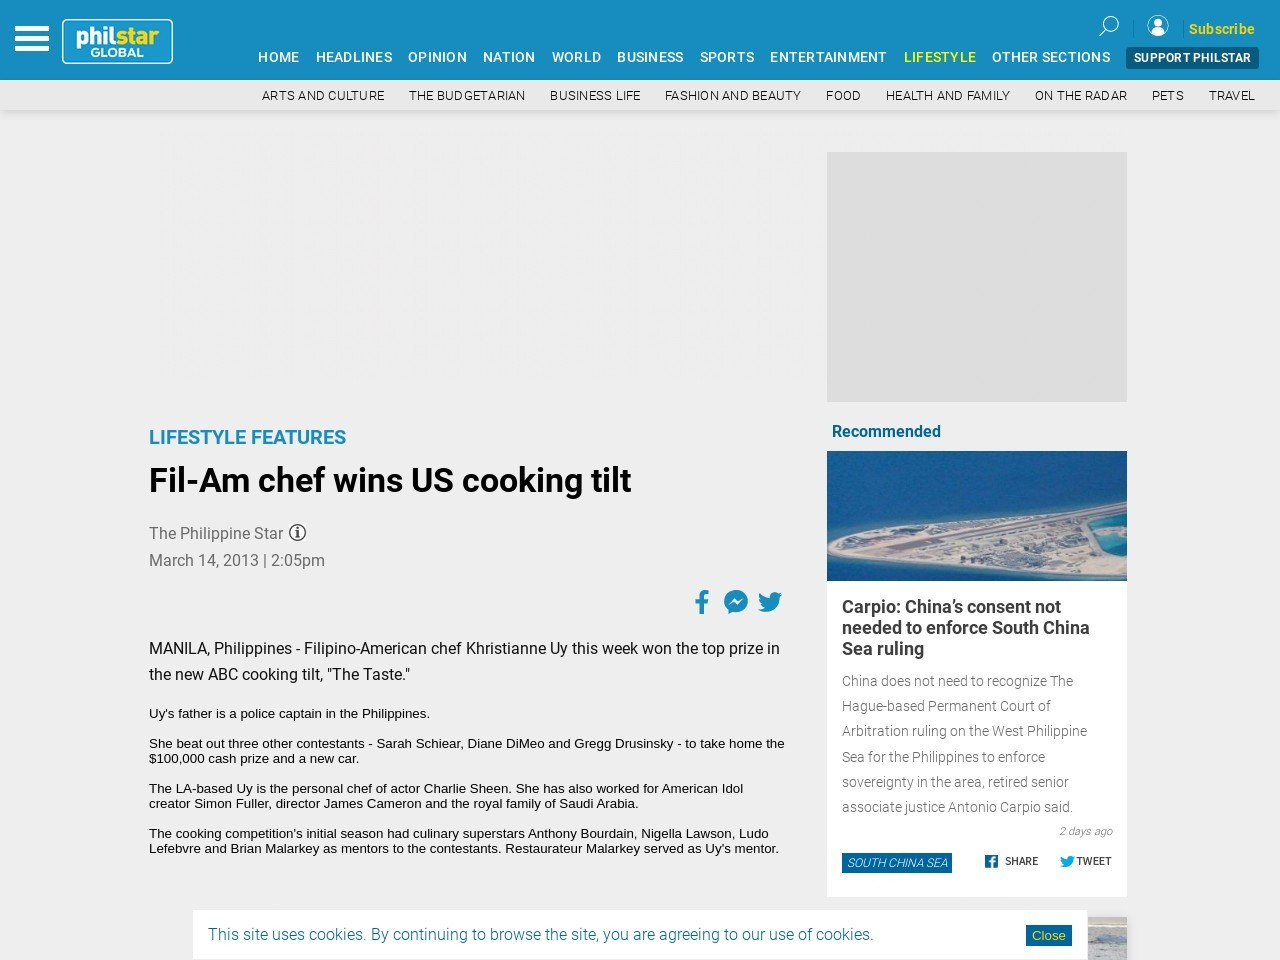 Fil-Am chef wins US cooking tilt